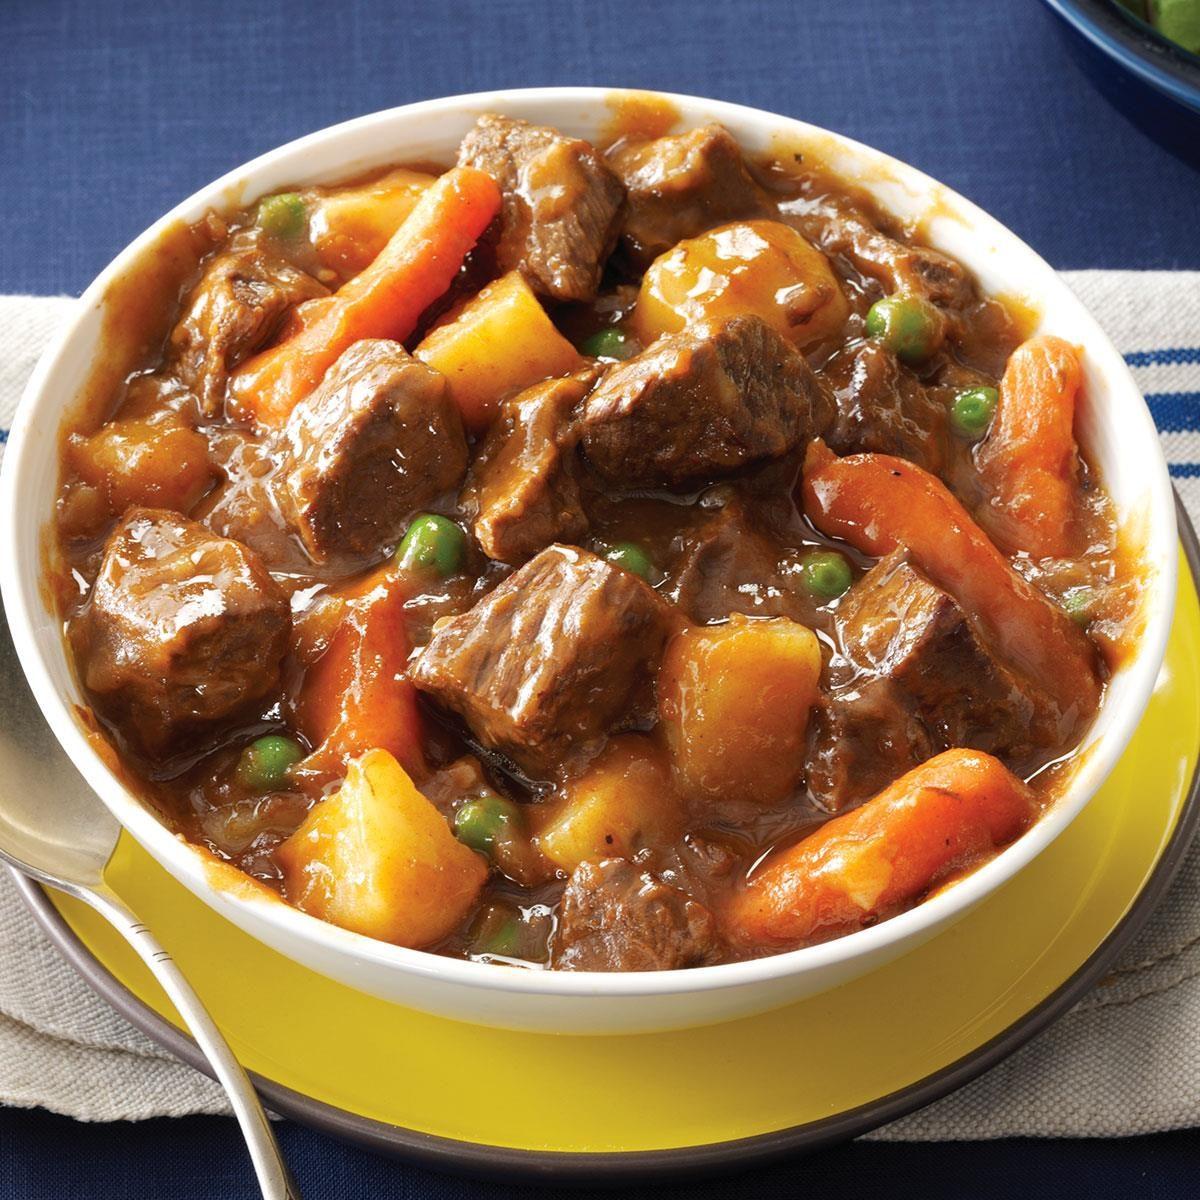 ... tailgaters favorite stew recipes dishmaps tailgaters favorite stew